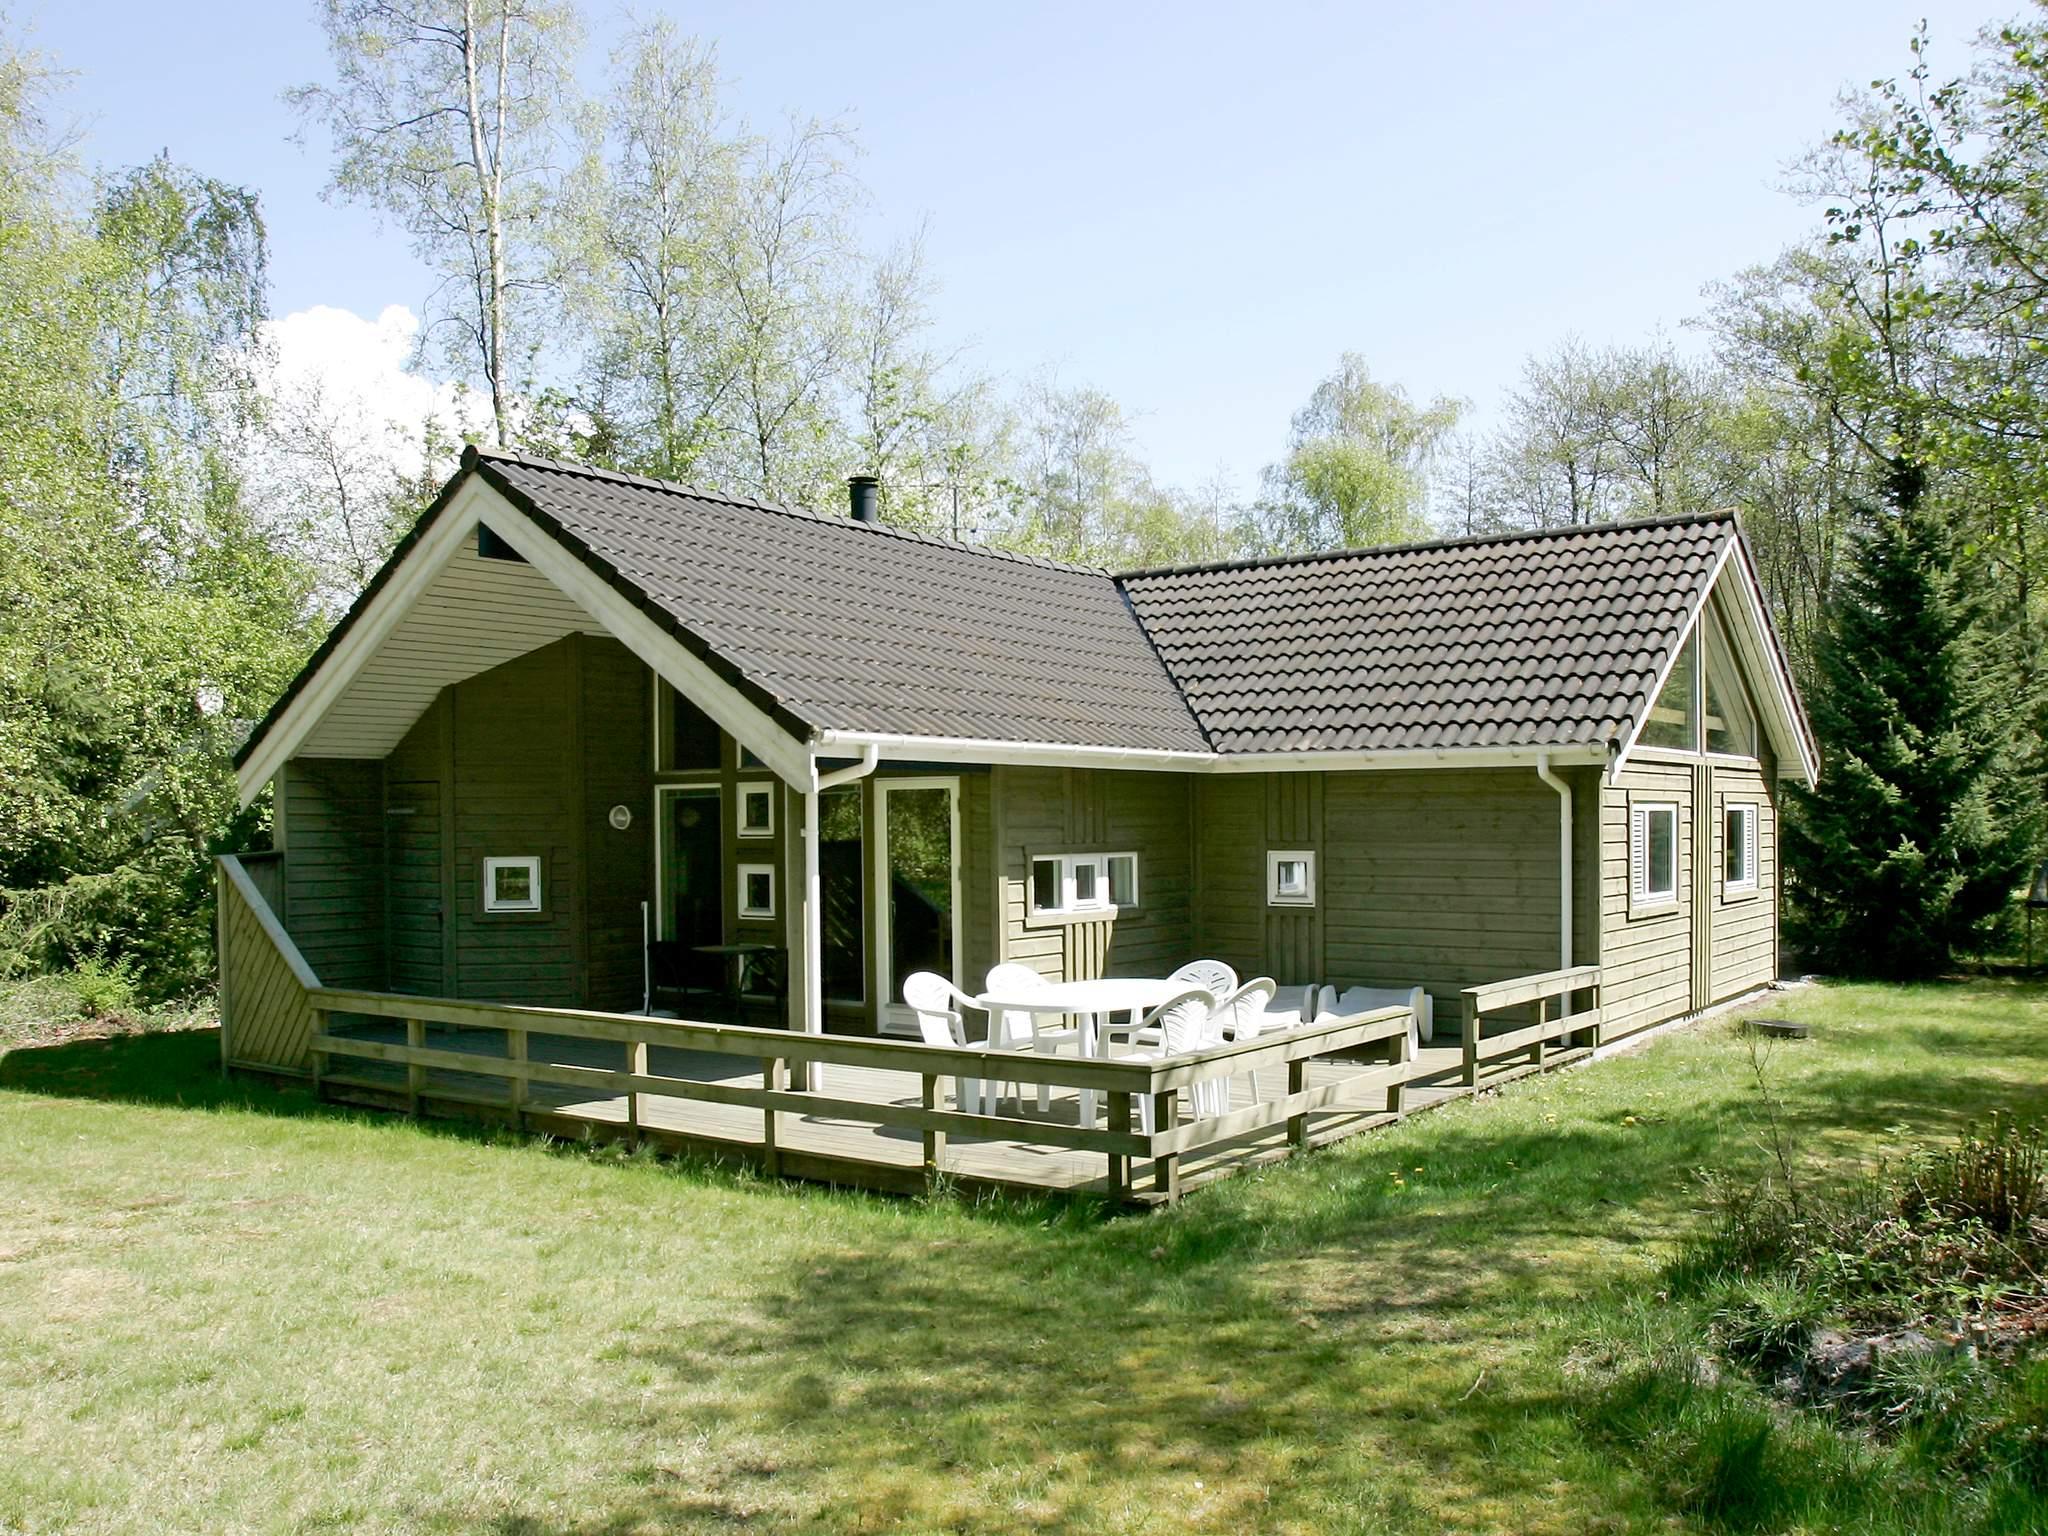 Ferienhaus Østre Sømarken (82542), Aakirkeby, , Bornholm, Dänemark, Bild 1